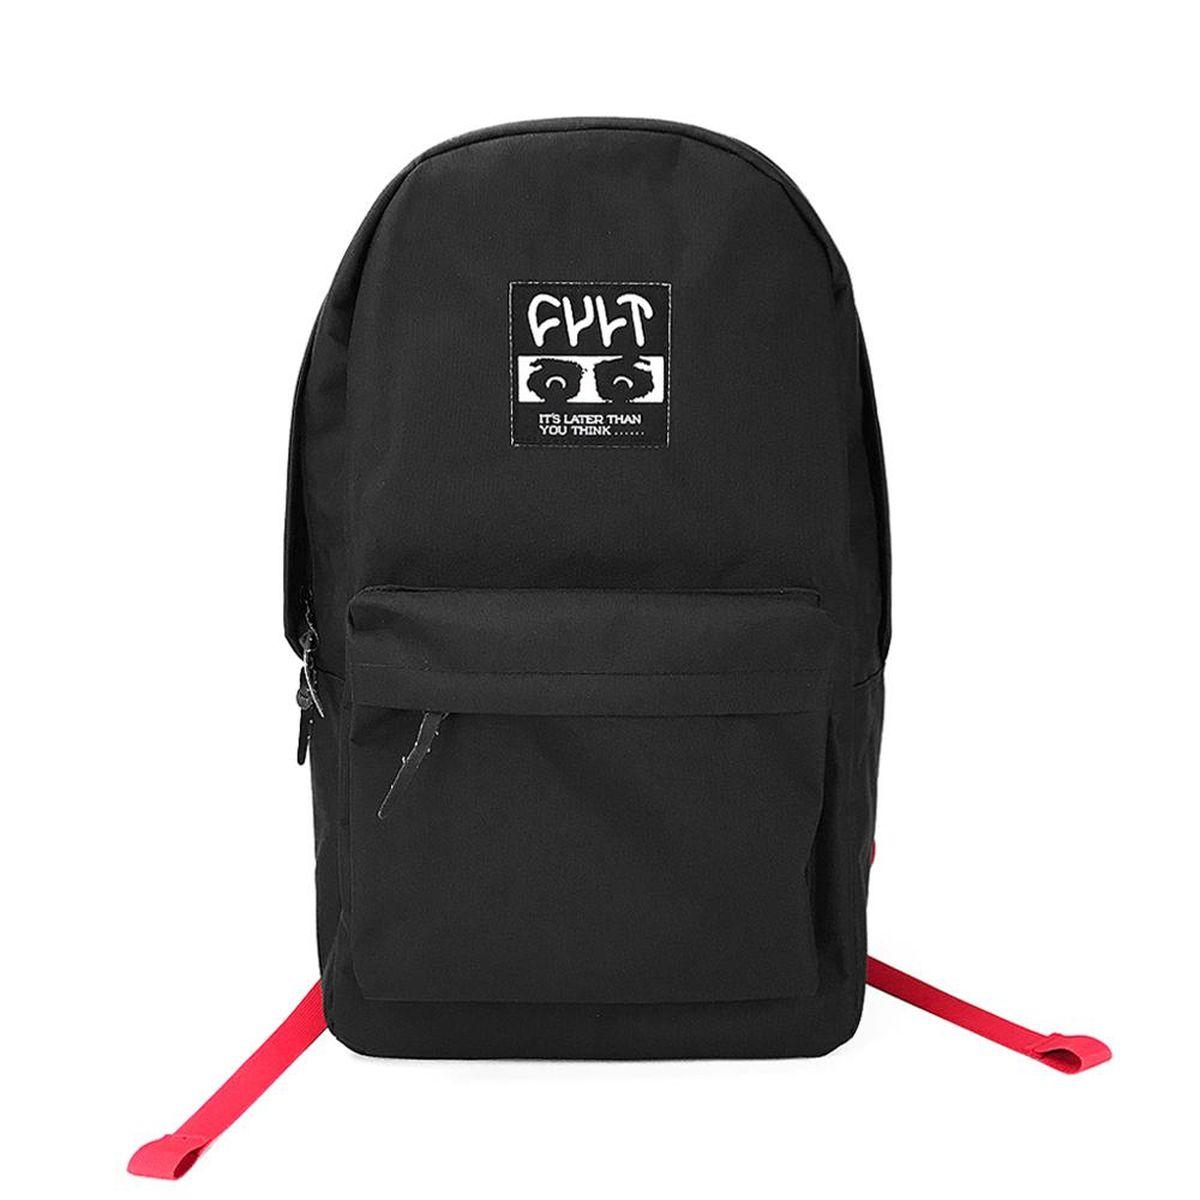 Plecak Cult Madness Bag Black